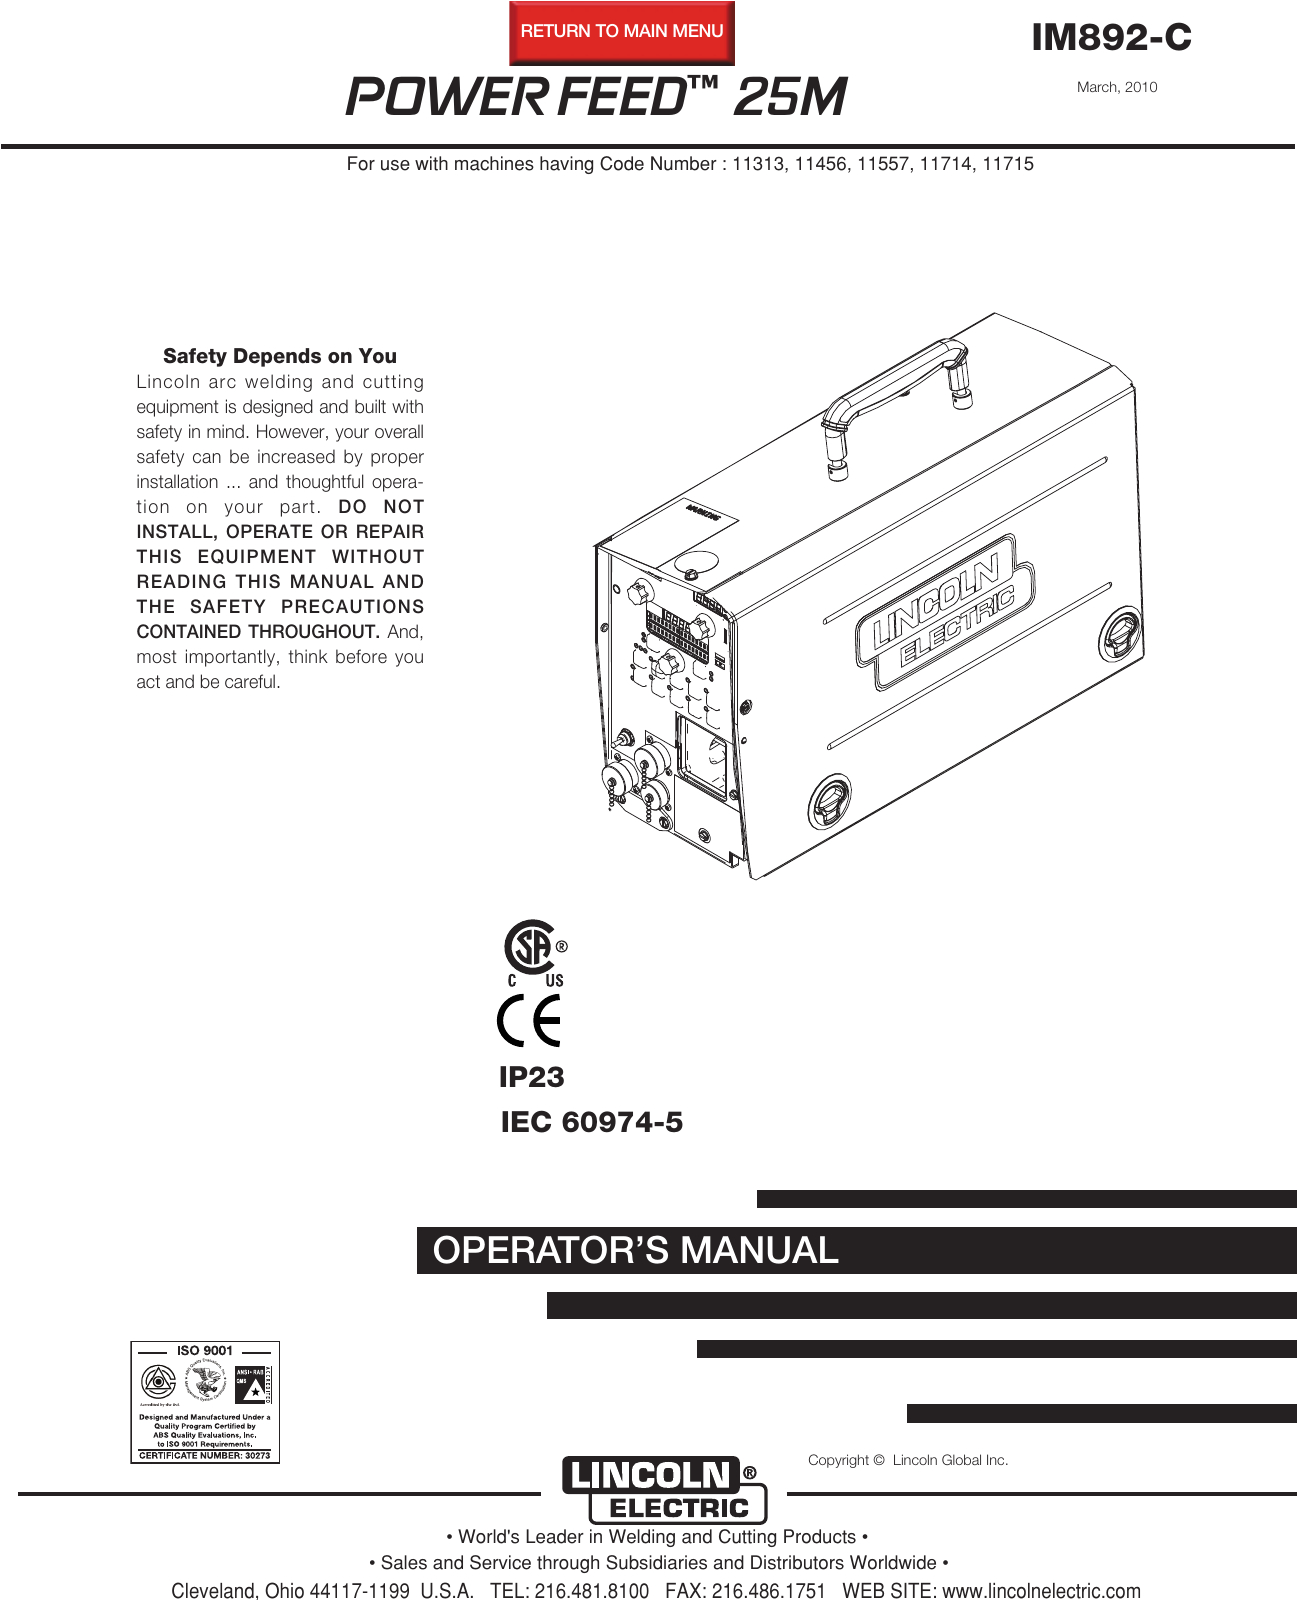 K870 Amptrol Wiring Diagram Lincoln Electric Power Feed Im892 C Users Manual